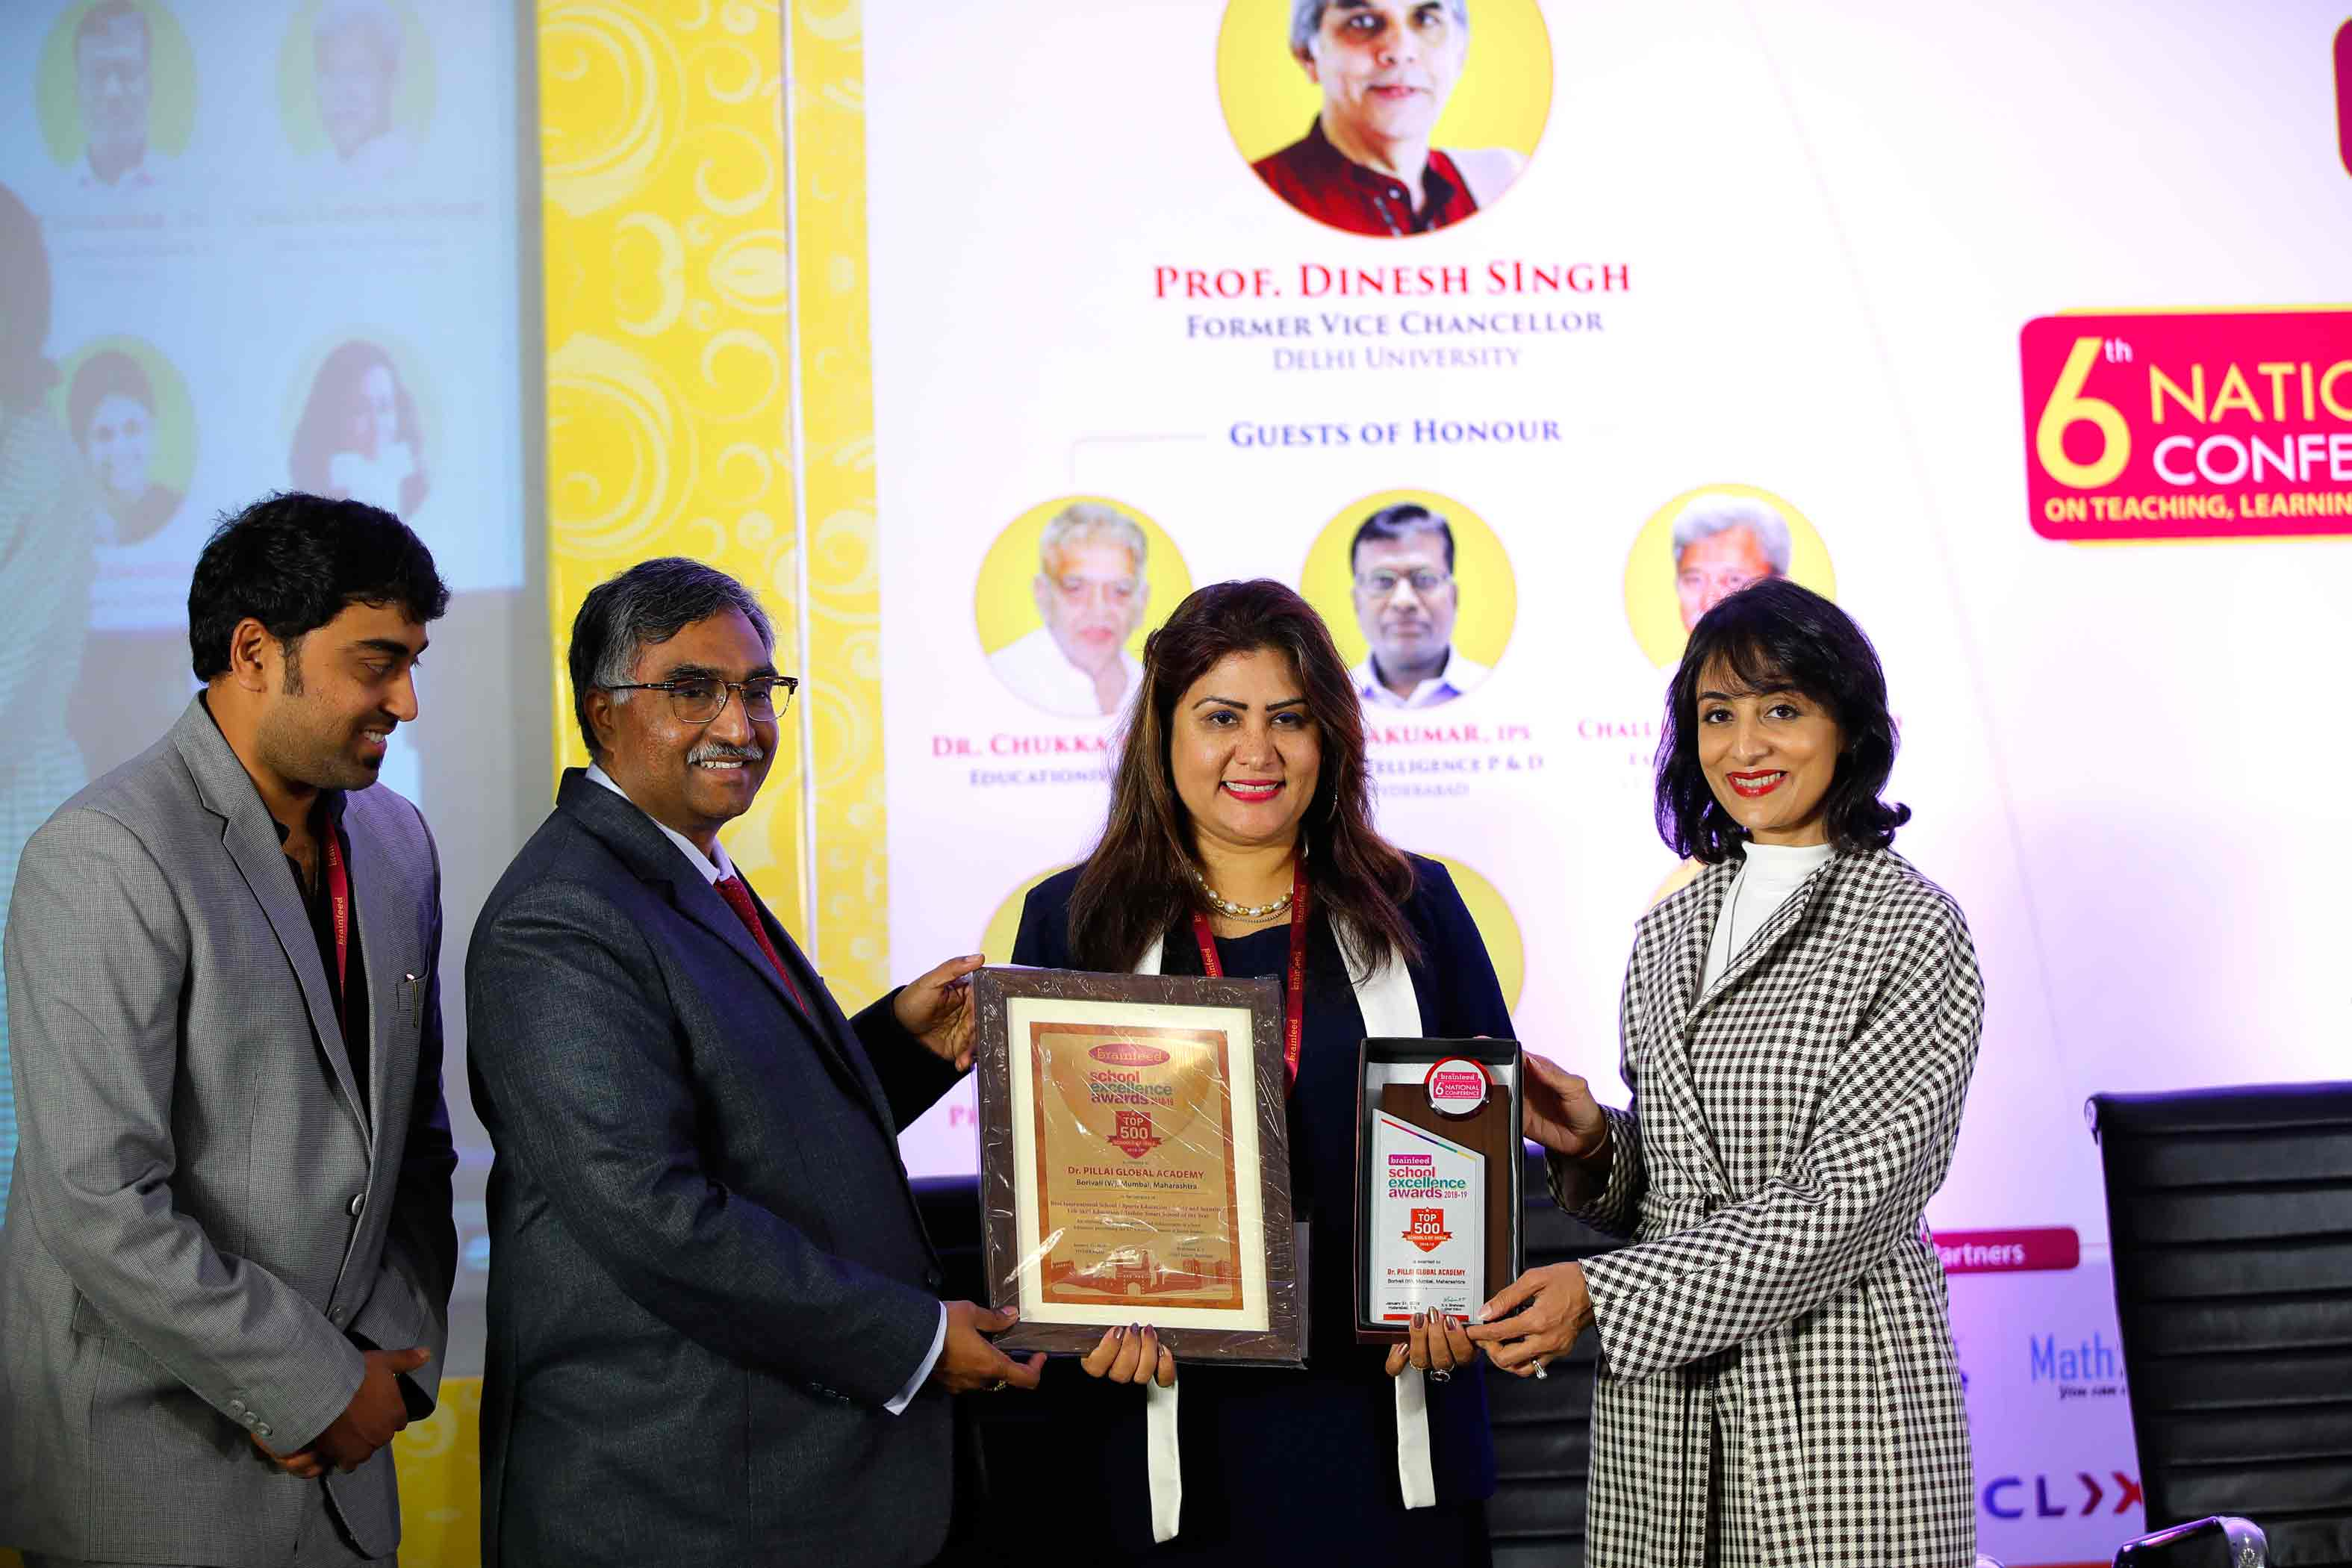 Dr.-Pillai-Global-Academy,-Borivali-(W),-Mumbai,-Maharashtra-(1)